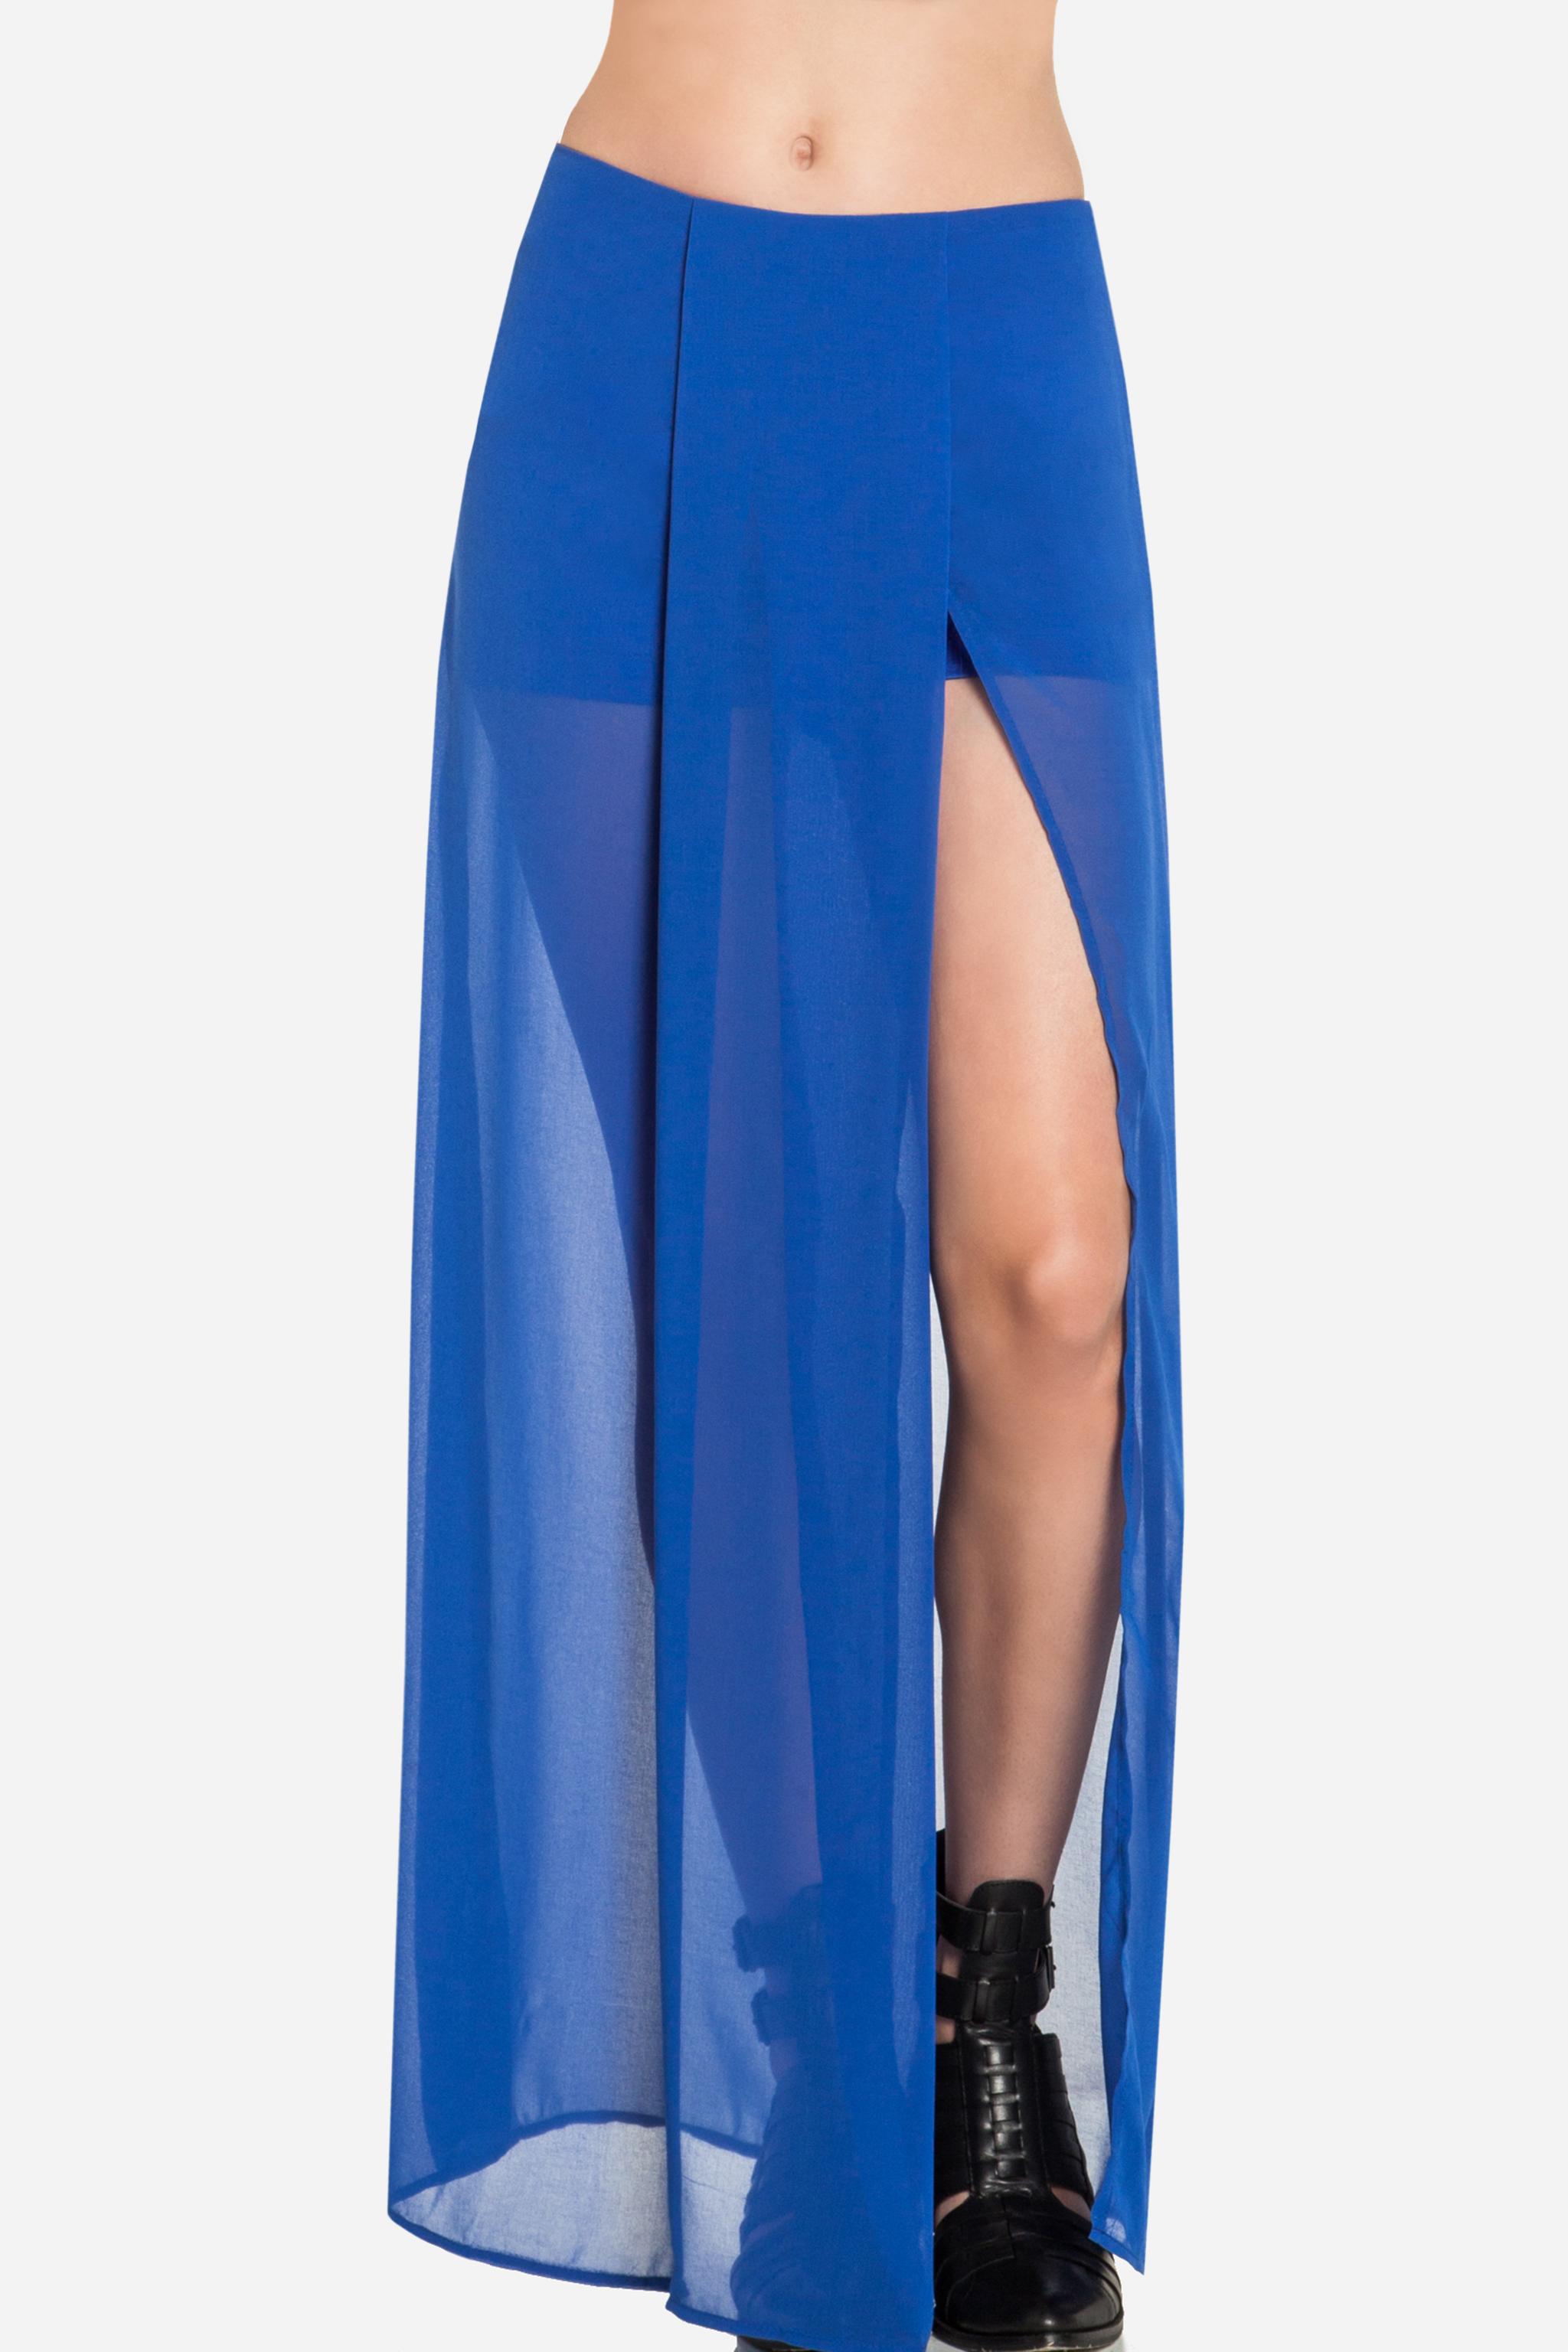 sheer maxi skirt in royal blue m l dailylook